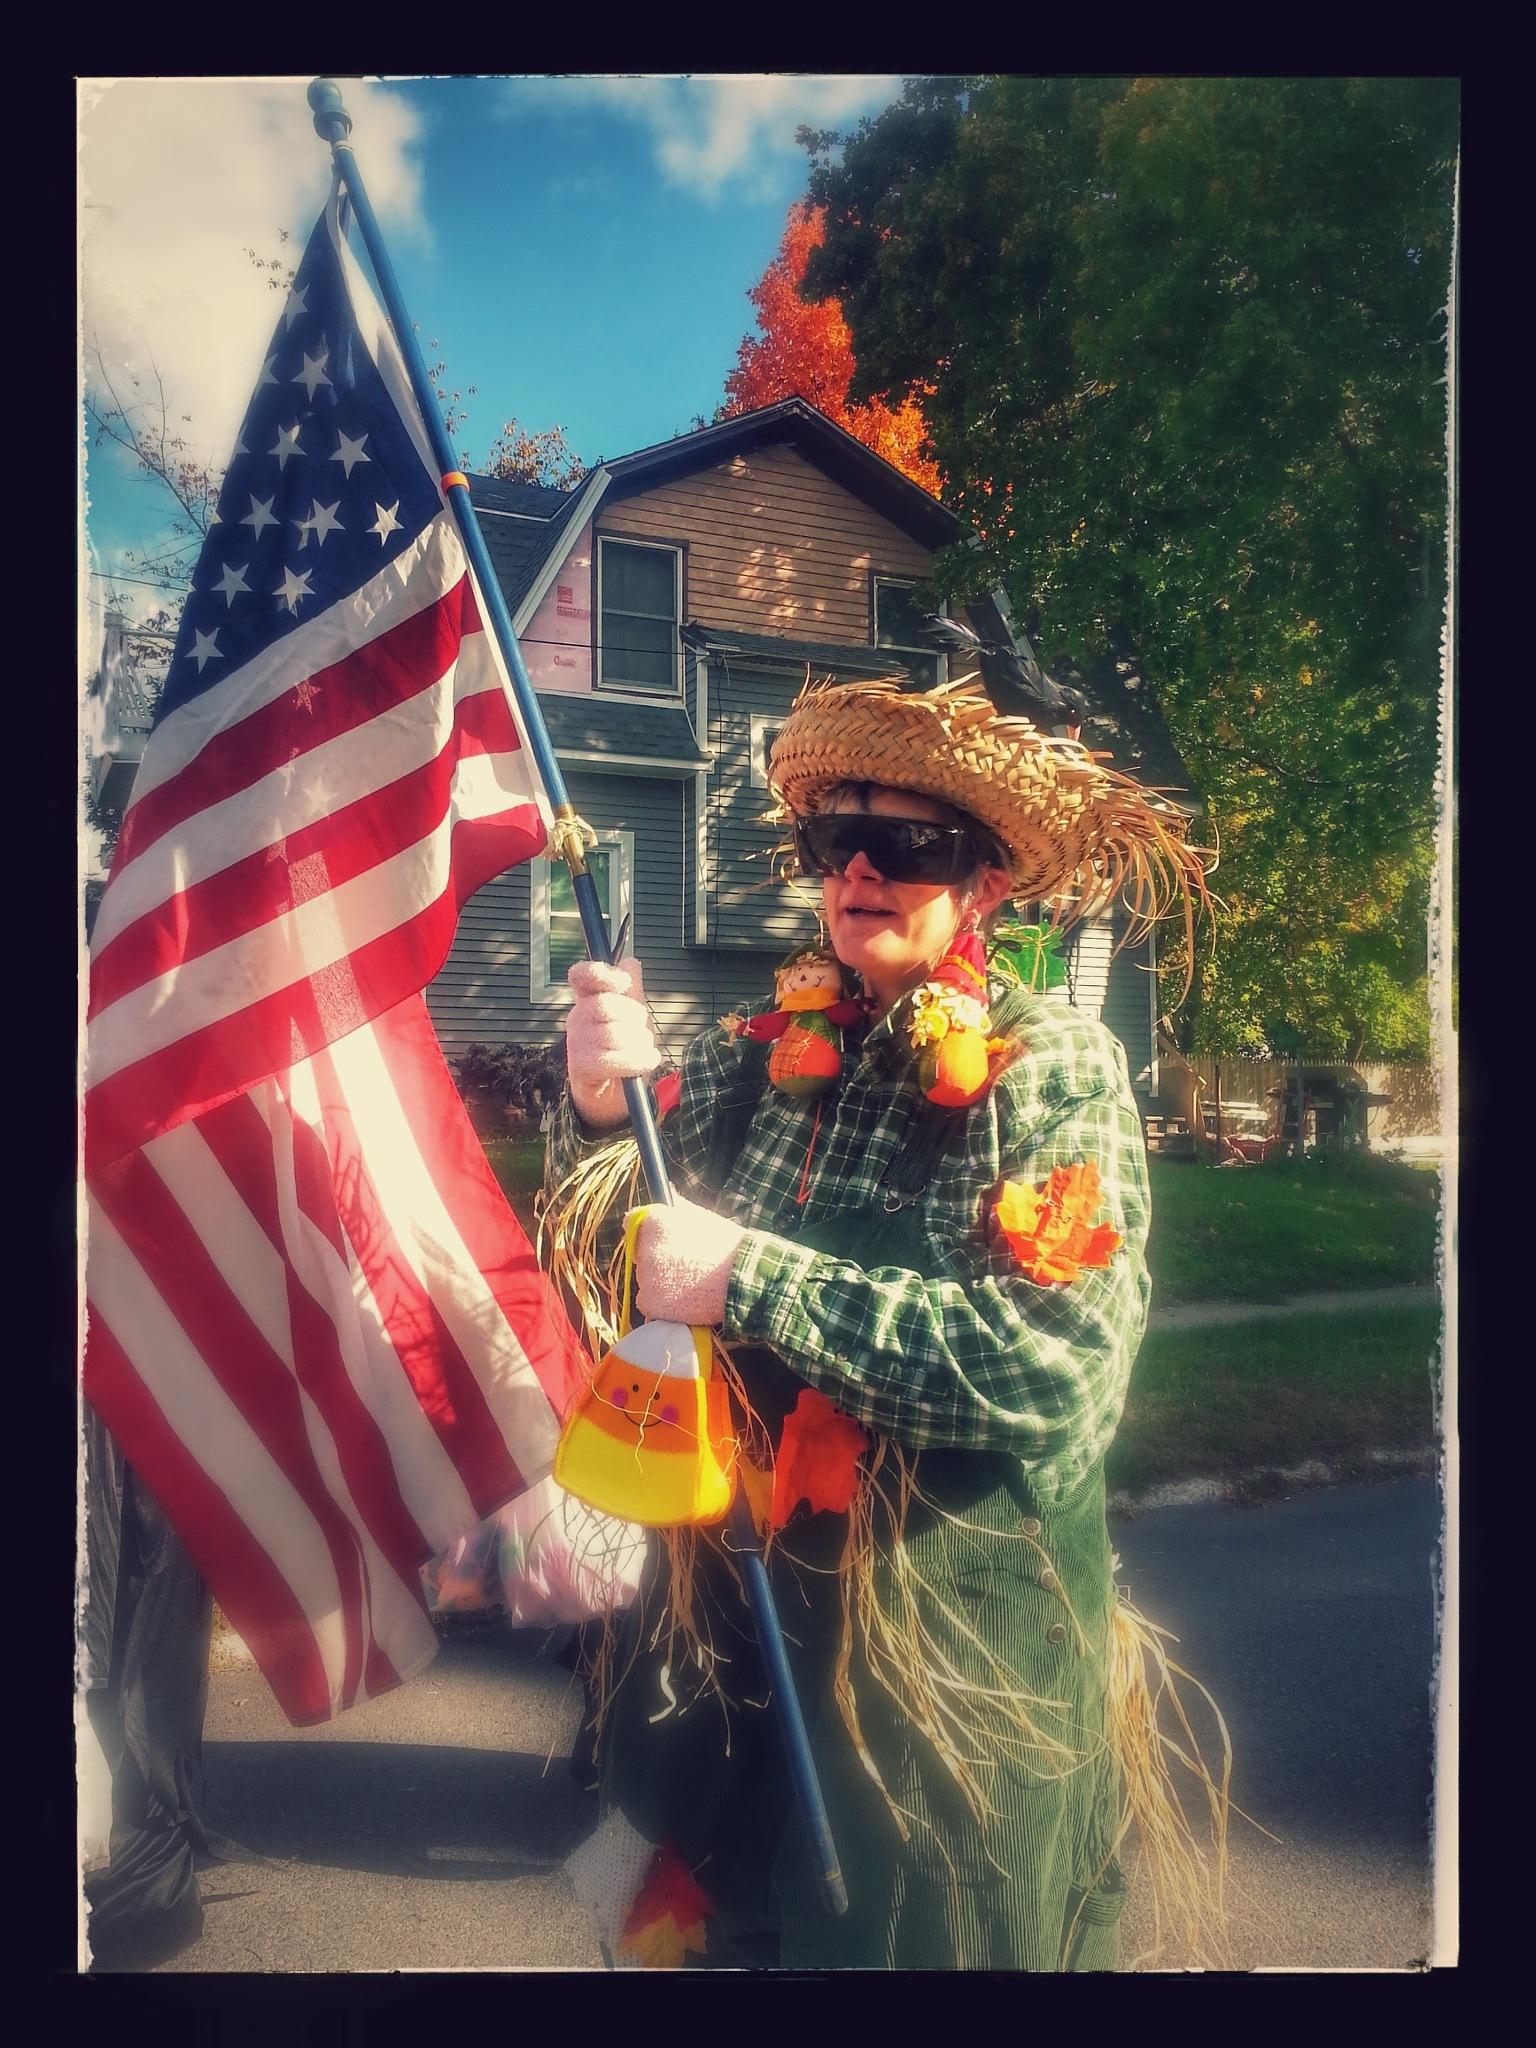 Patriotic Scarecrow by Spiritlight